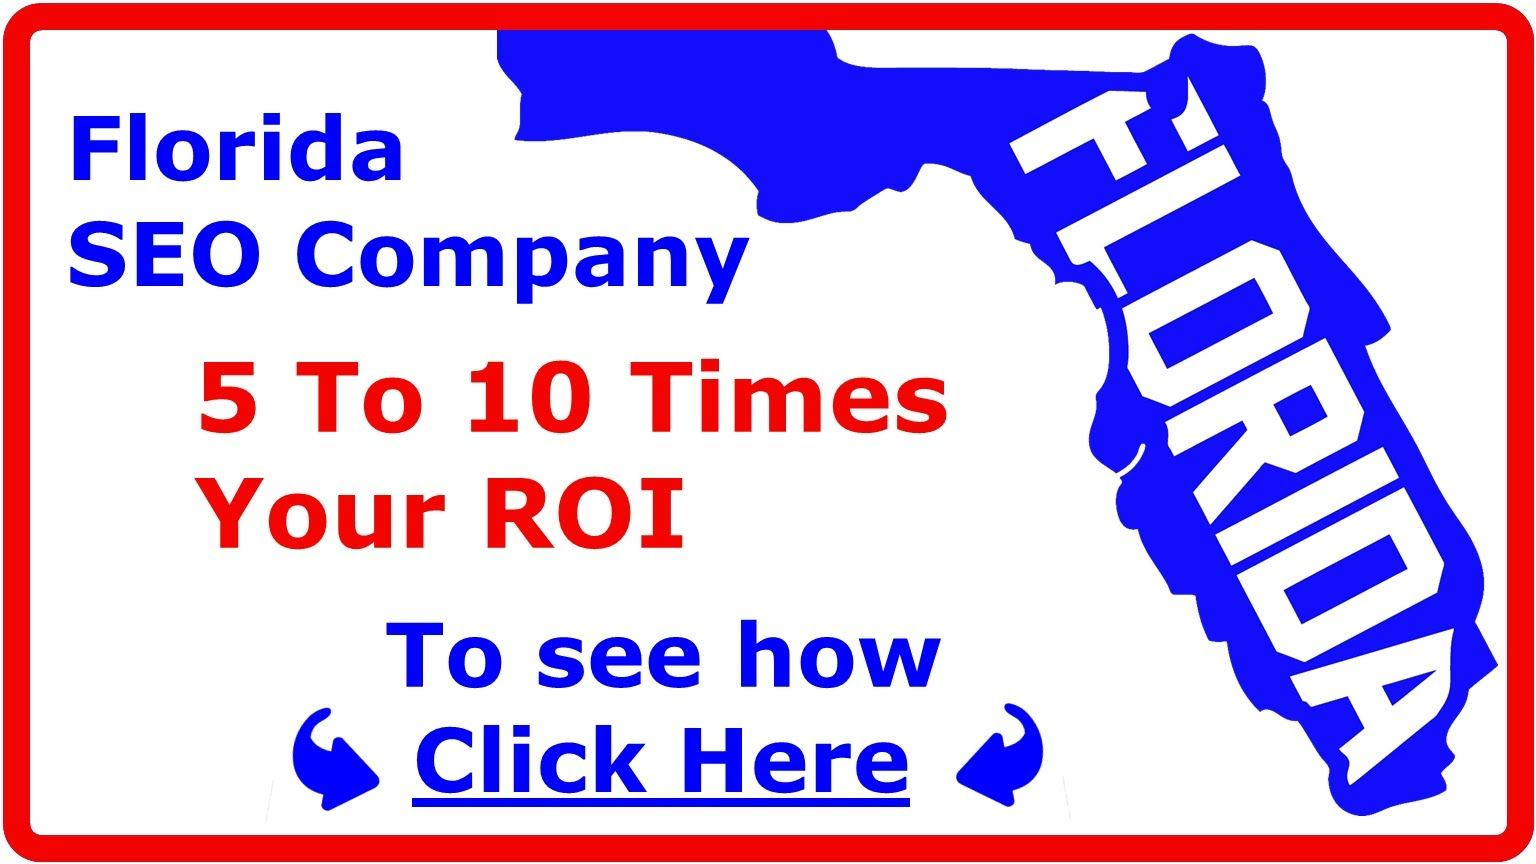 Miami Florida SEO Company That Gets You 5 to 10 Times ROI